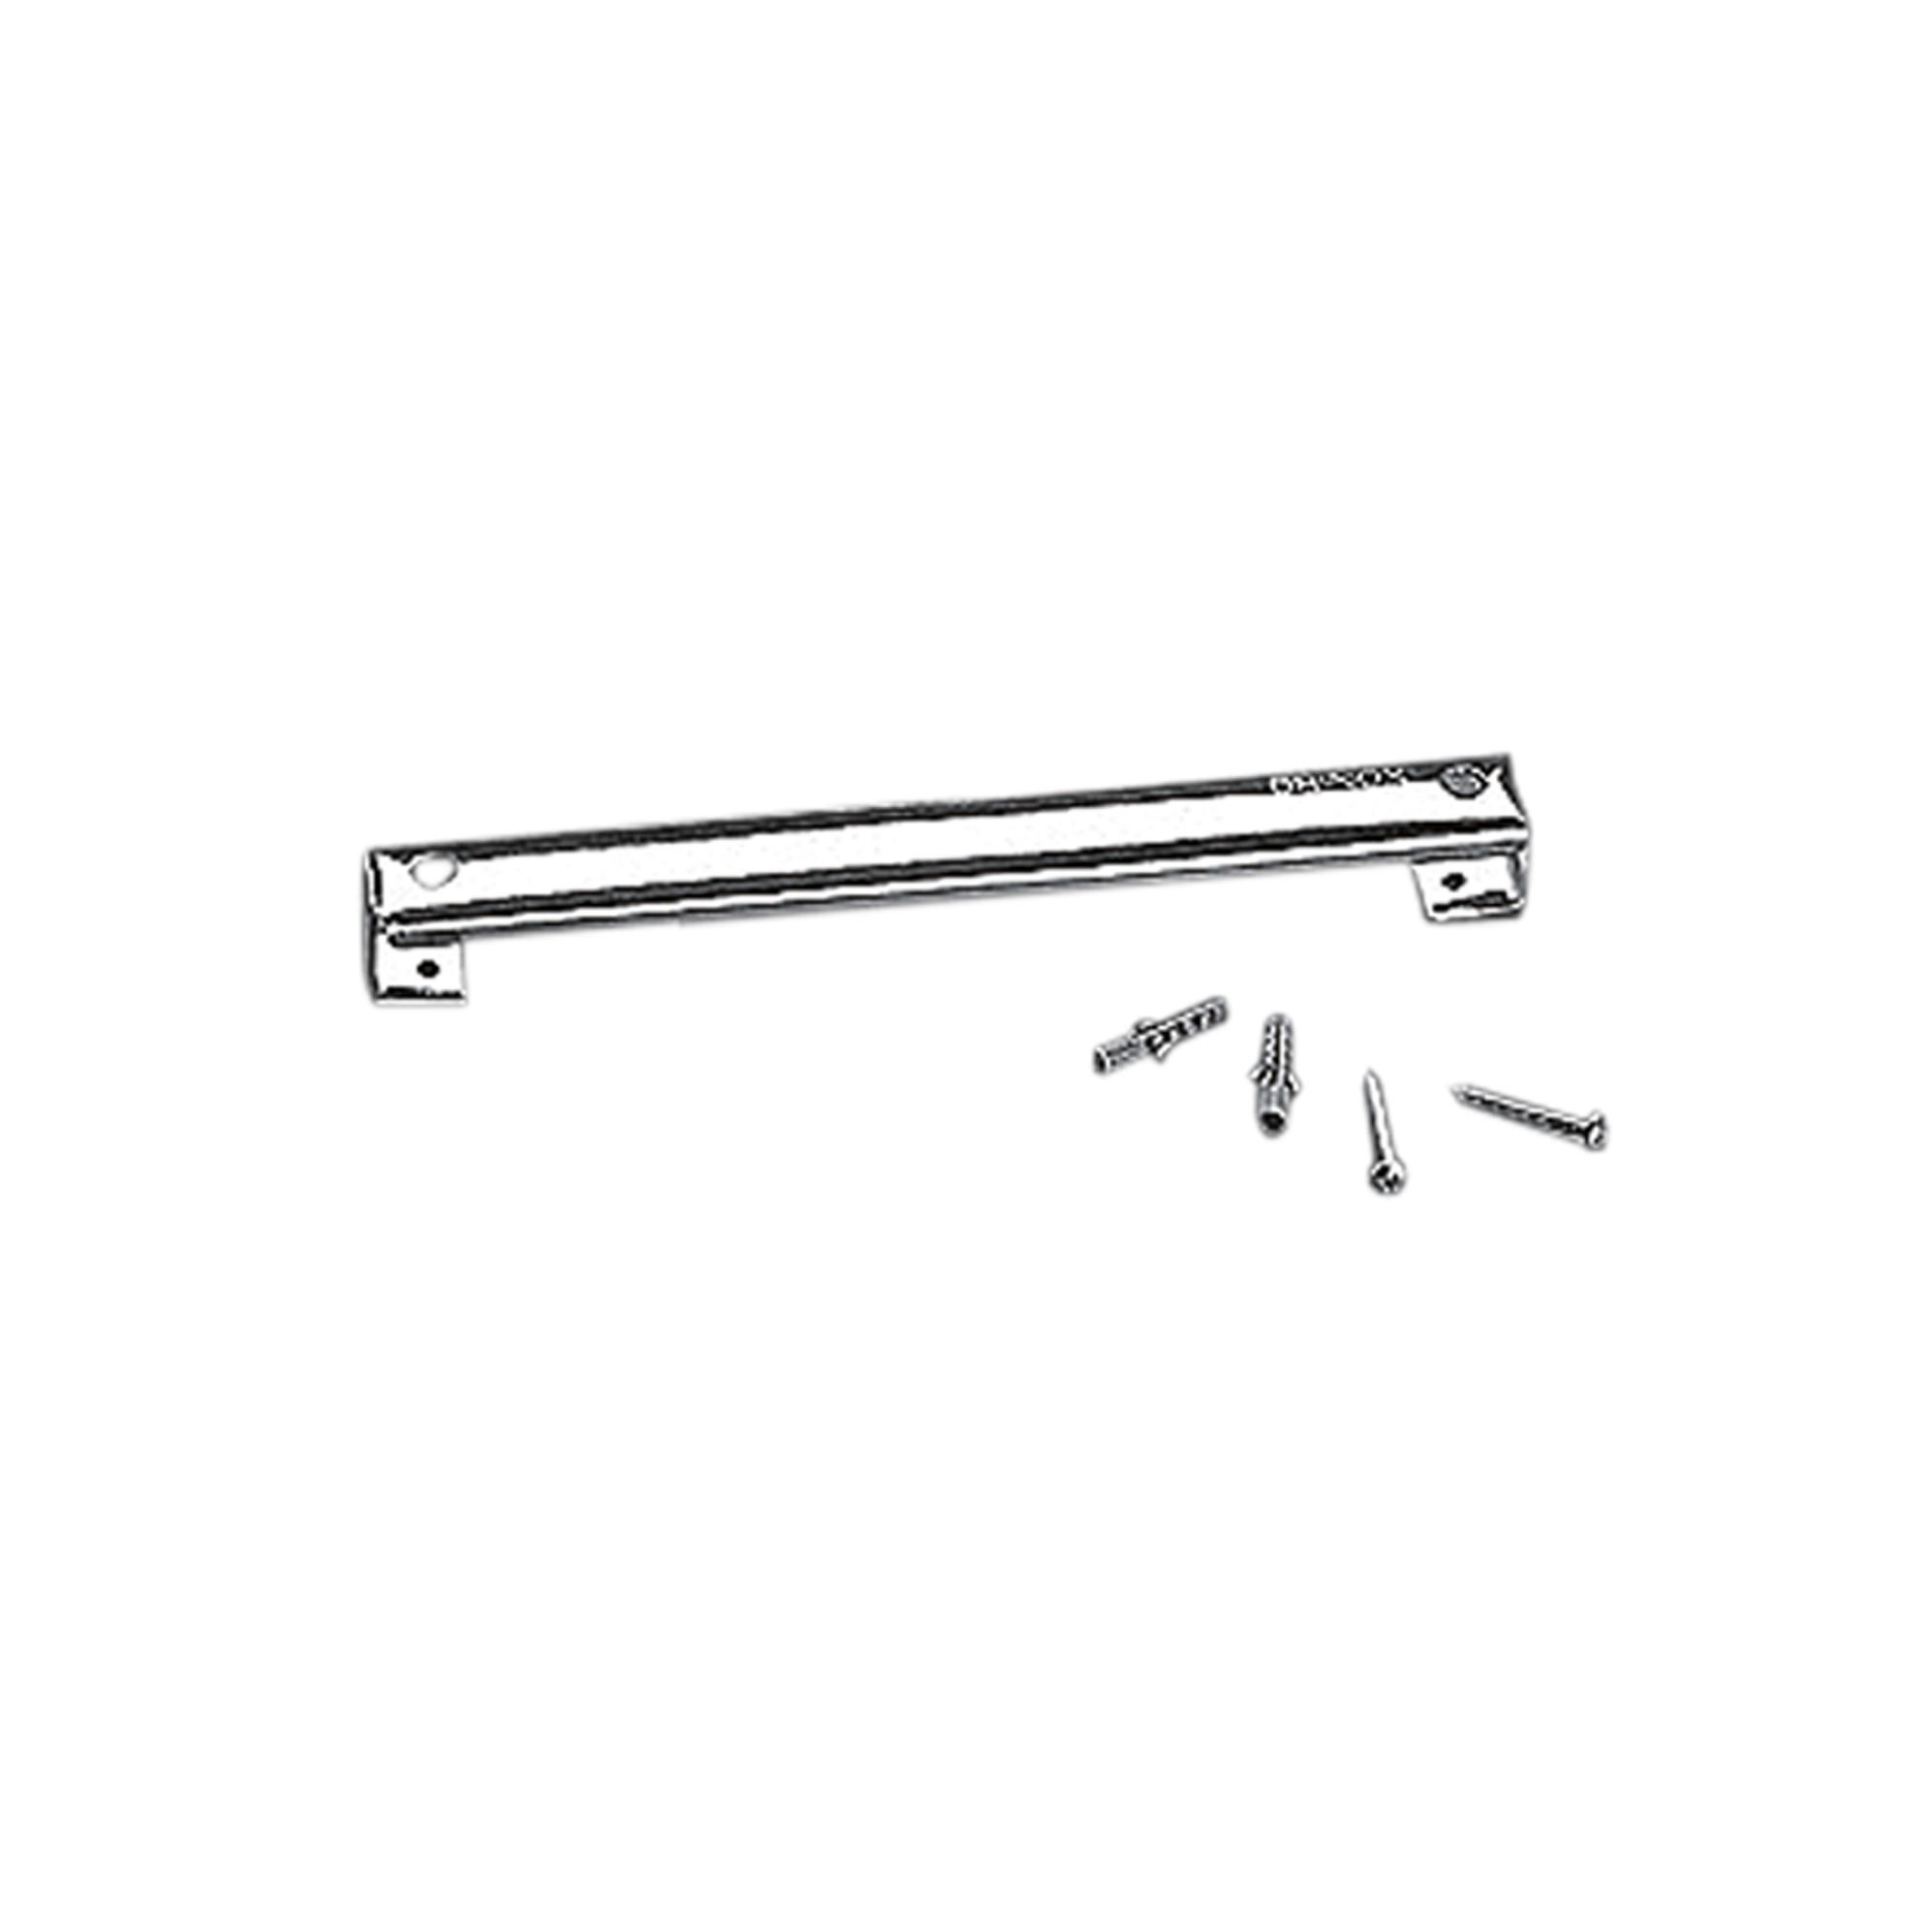 Barra para Utensilios Inox 40cm - Brinox